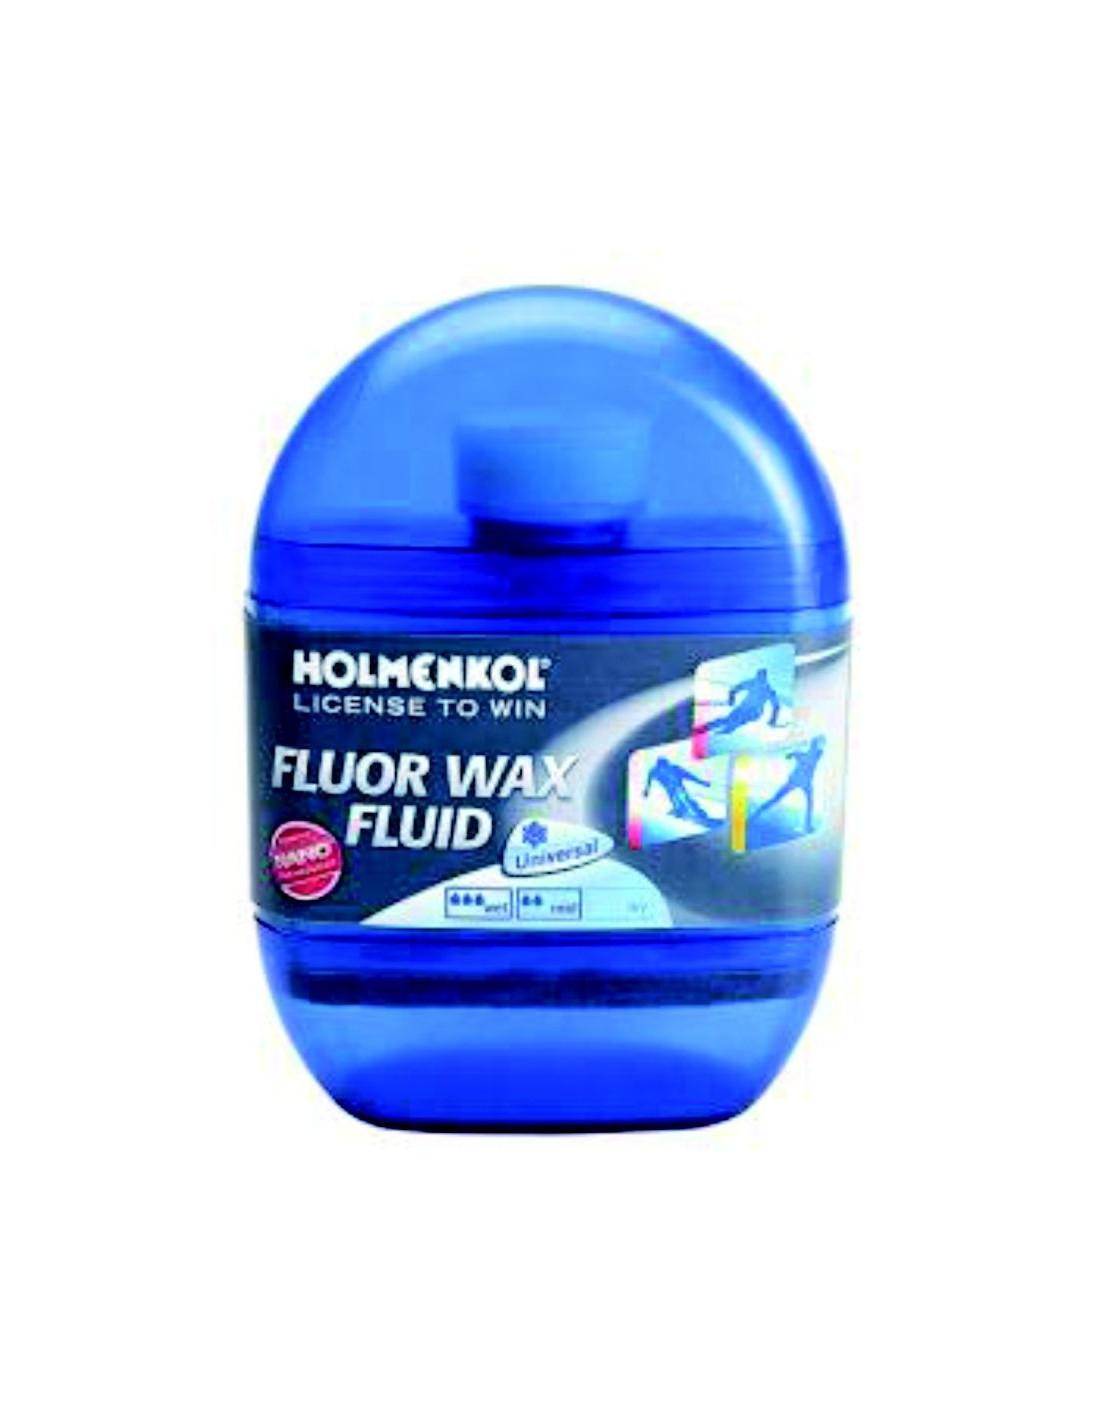 Holmenkol Fluor Wax Fluid Wachsart - Flüssigwachs, Einsatzbereich - Alpin, Wach